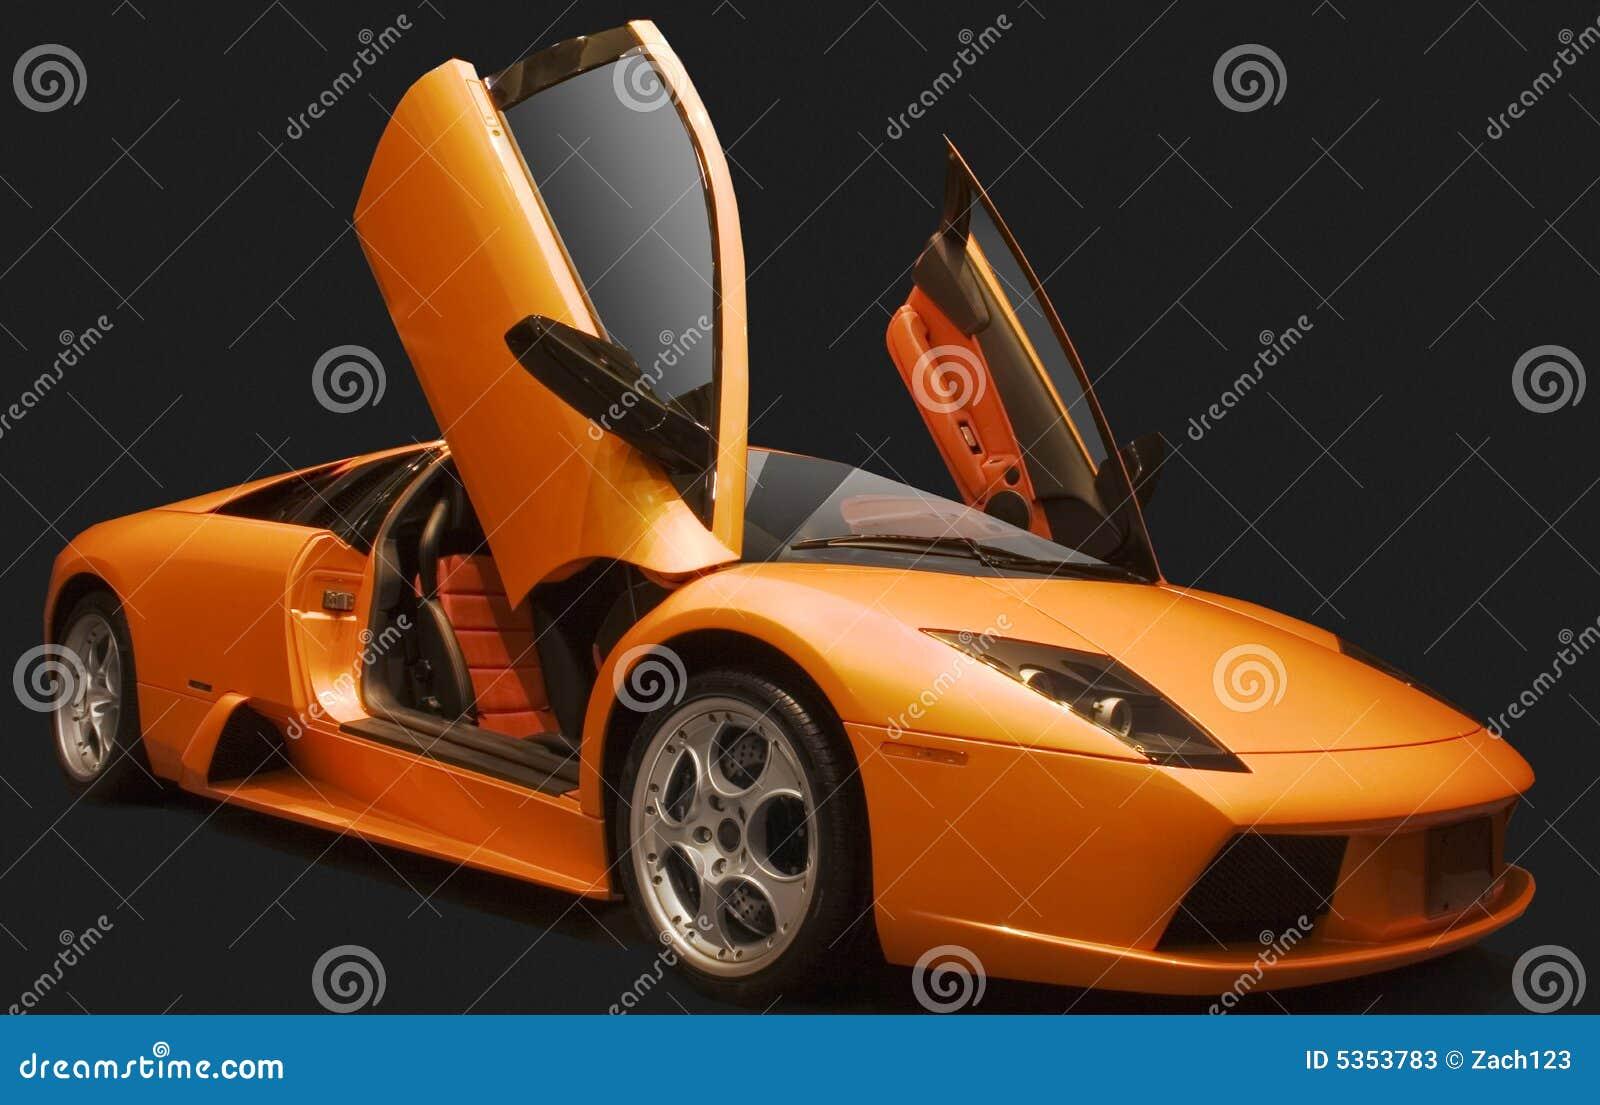 Samochód sorange sporty.